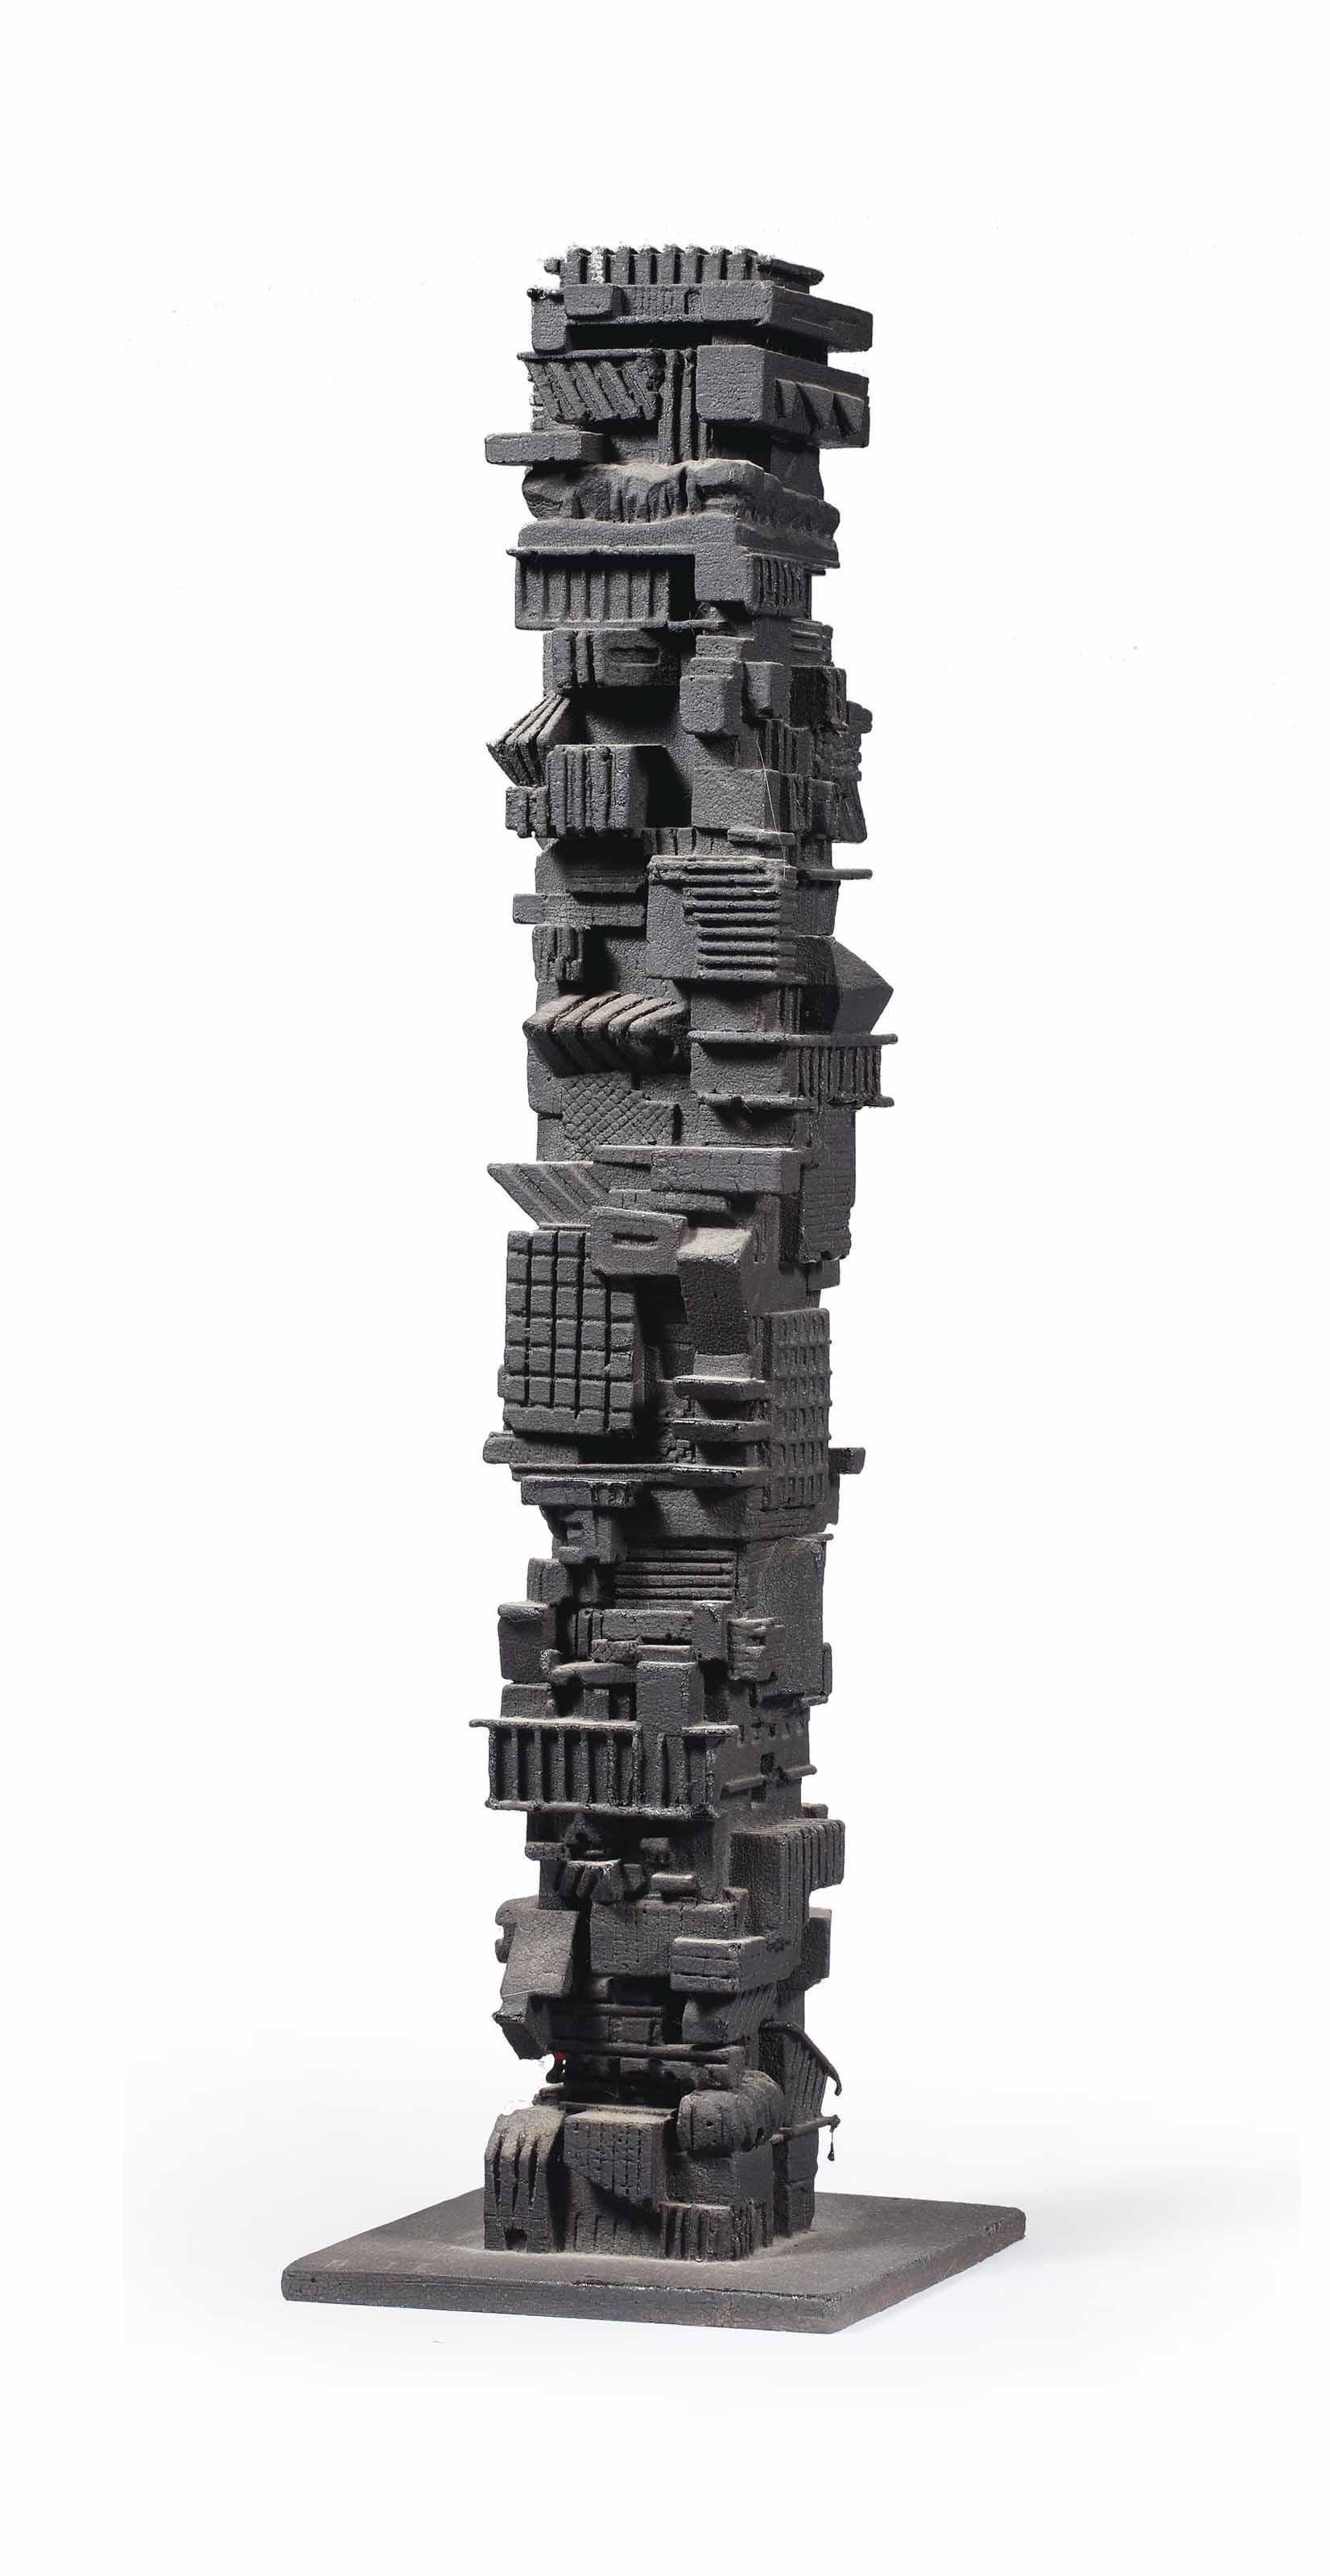 Maquette for non-homogenous apartment, San Paolo, Brazil